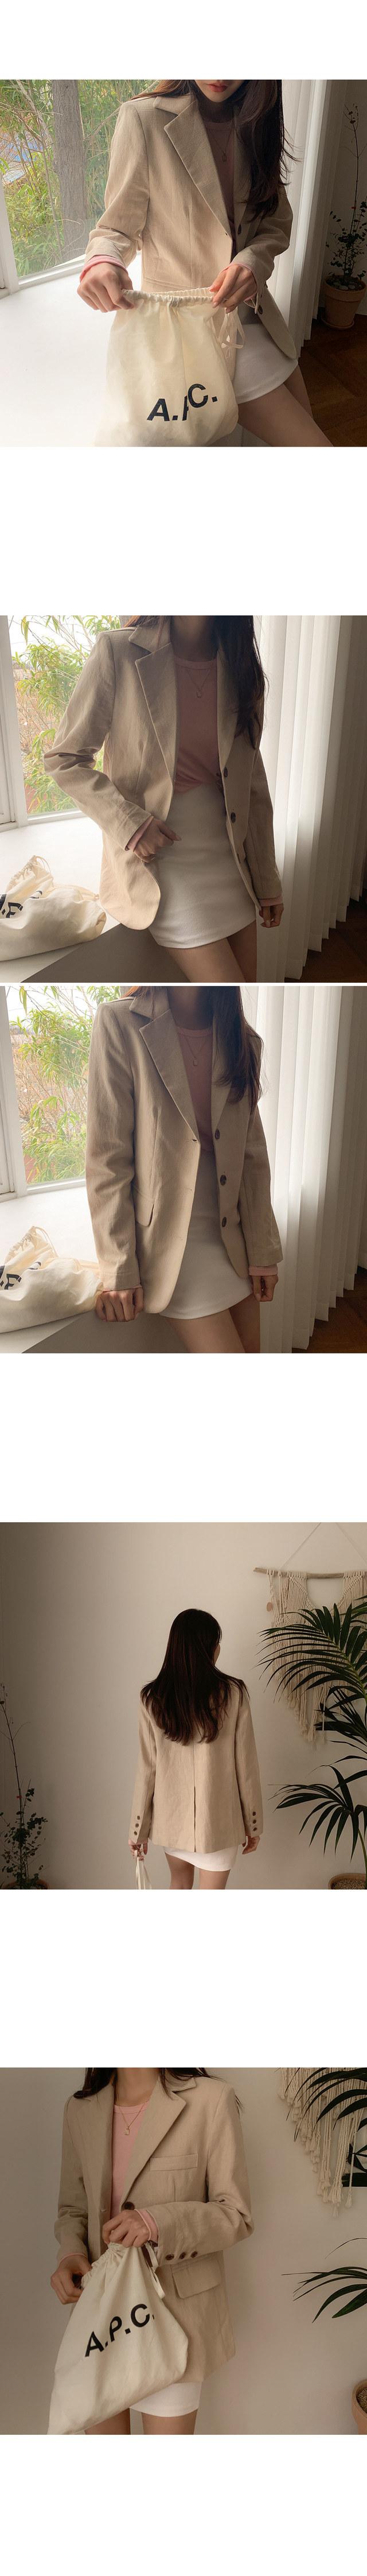 Pekers Cotton Skirt